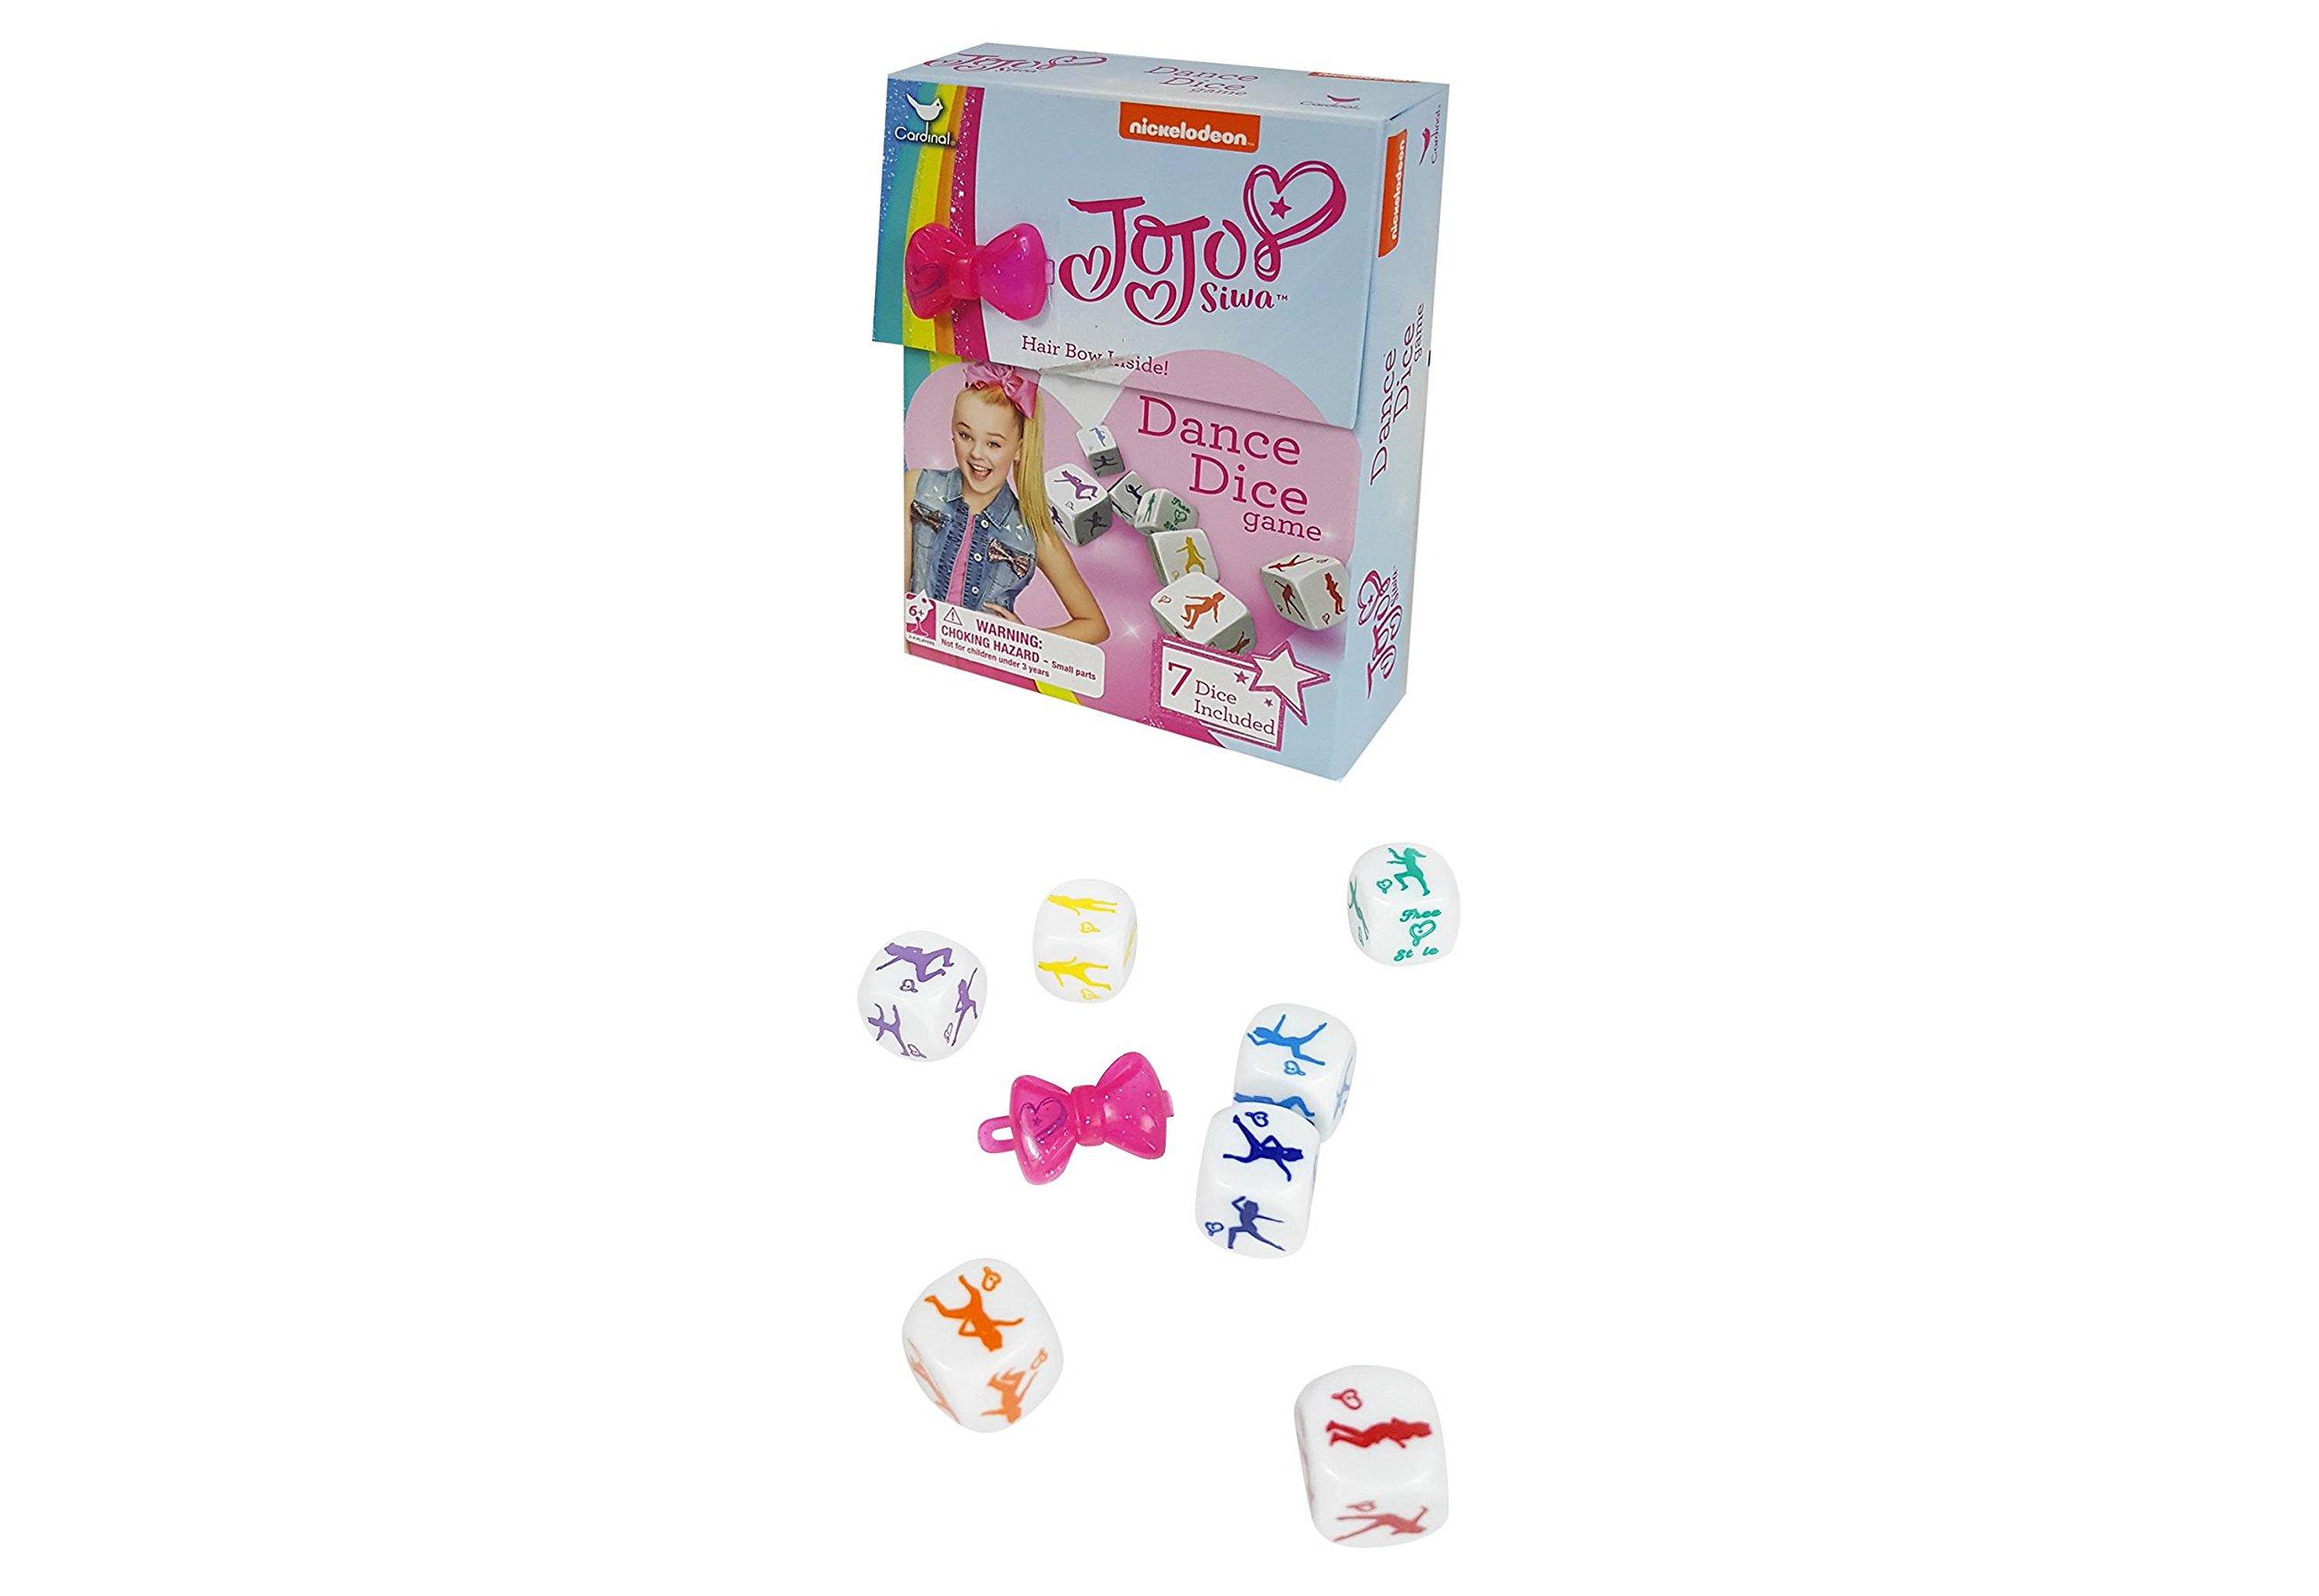 JoJo Siwa Dance Dice Game & Mystery surprise mini bow